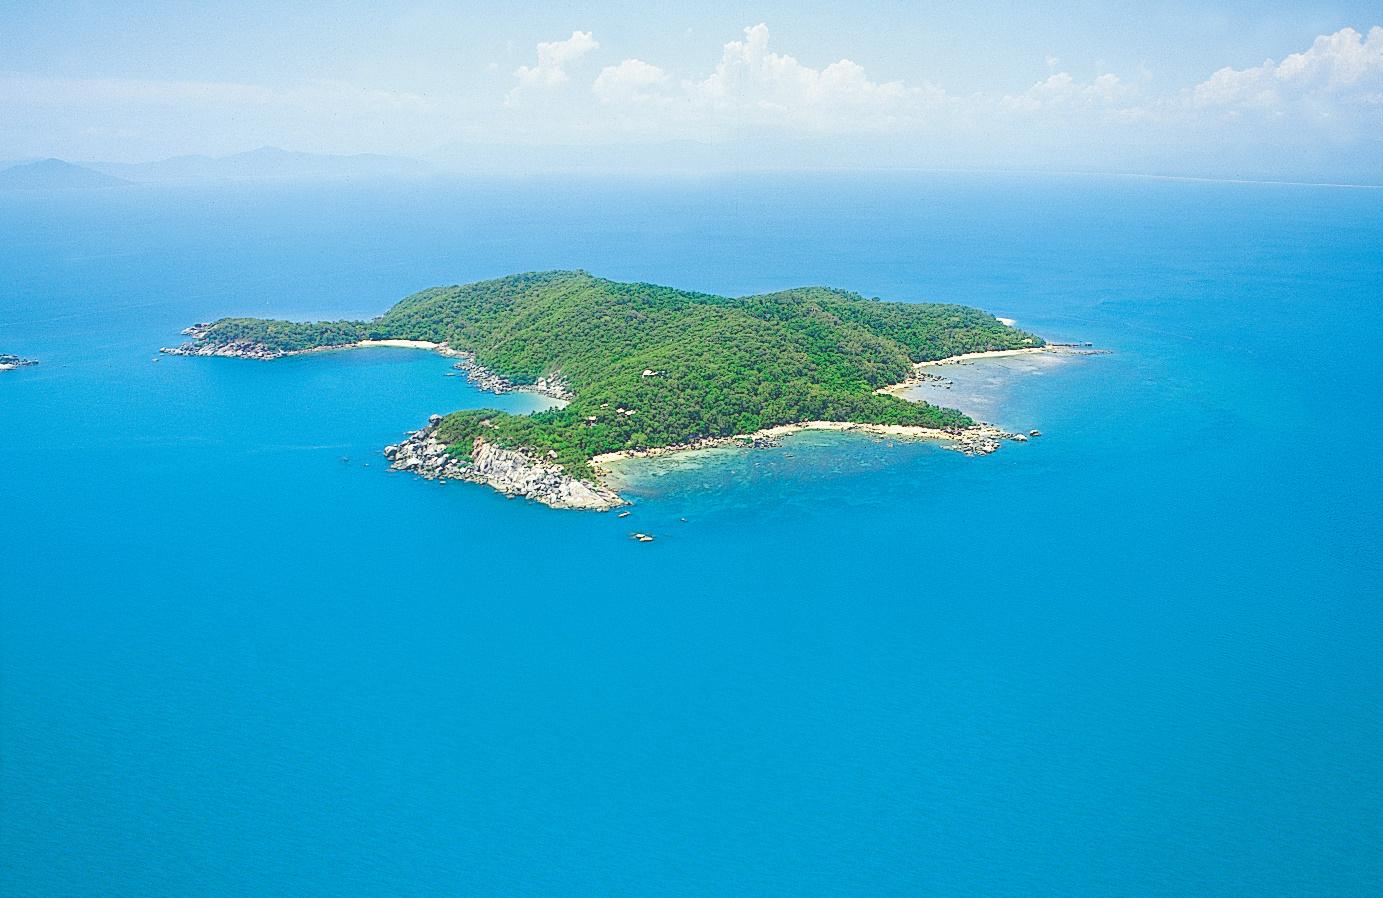 Bedarra Island - Wikipedia